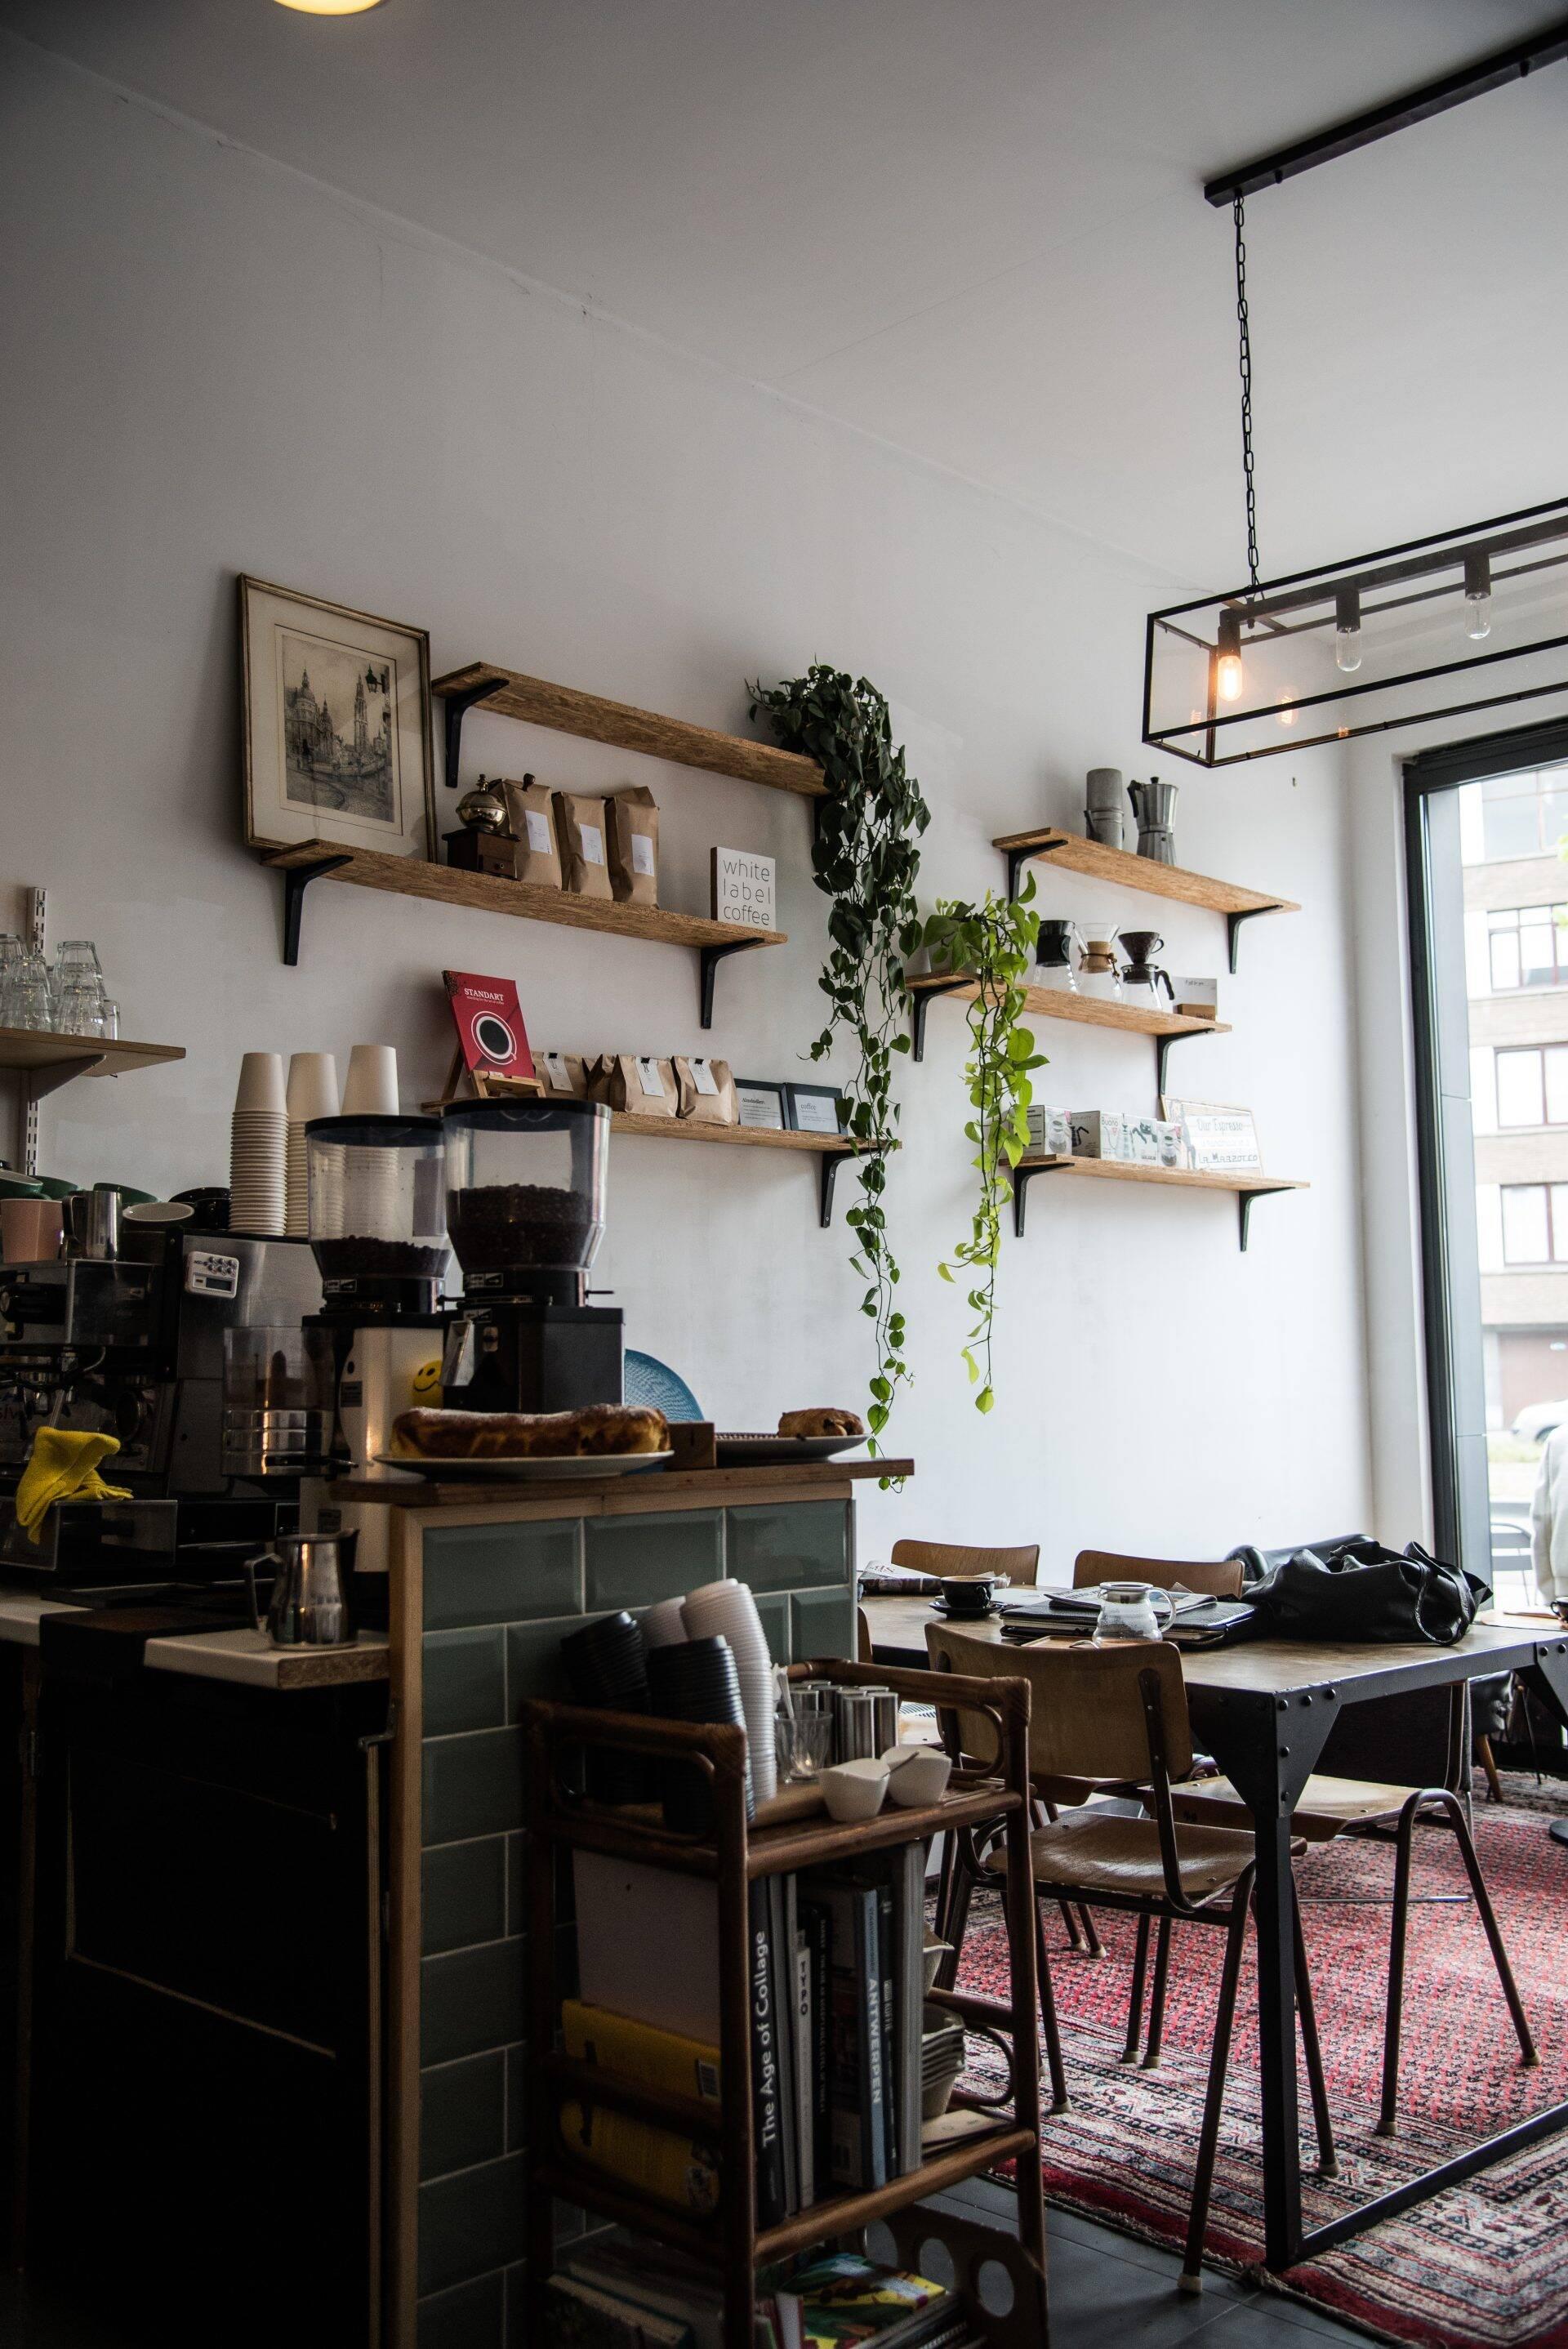 Georges espressobar in Antwerpen